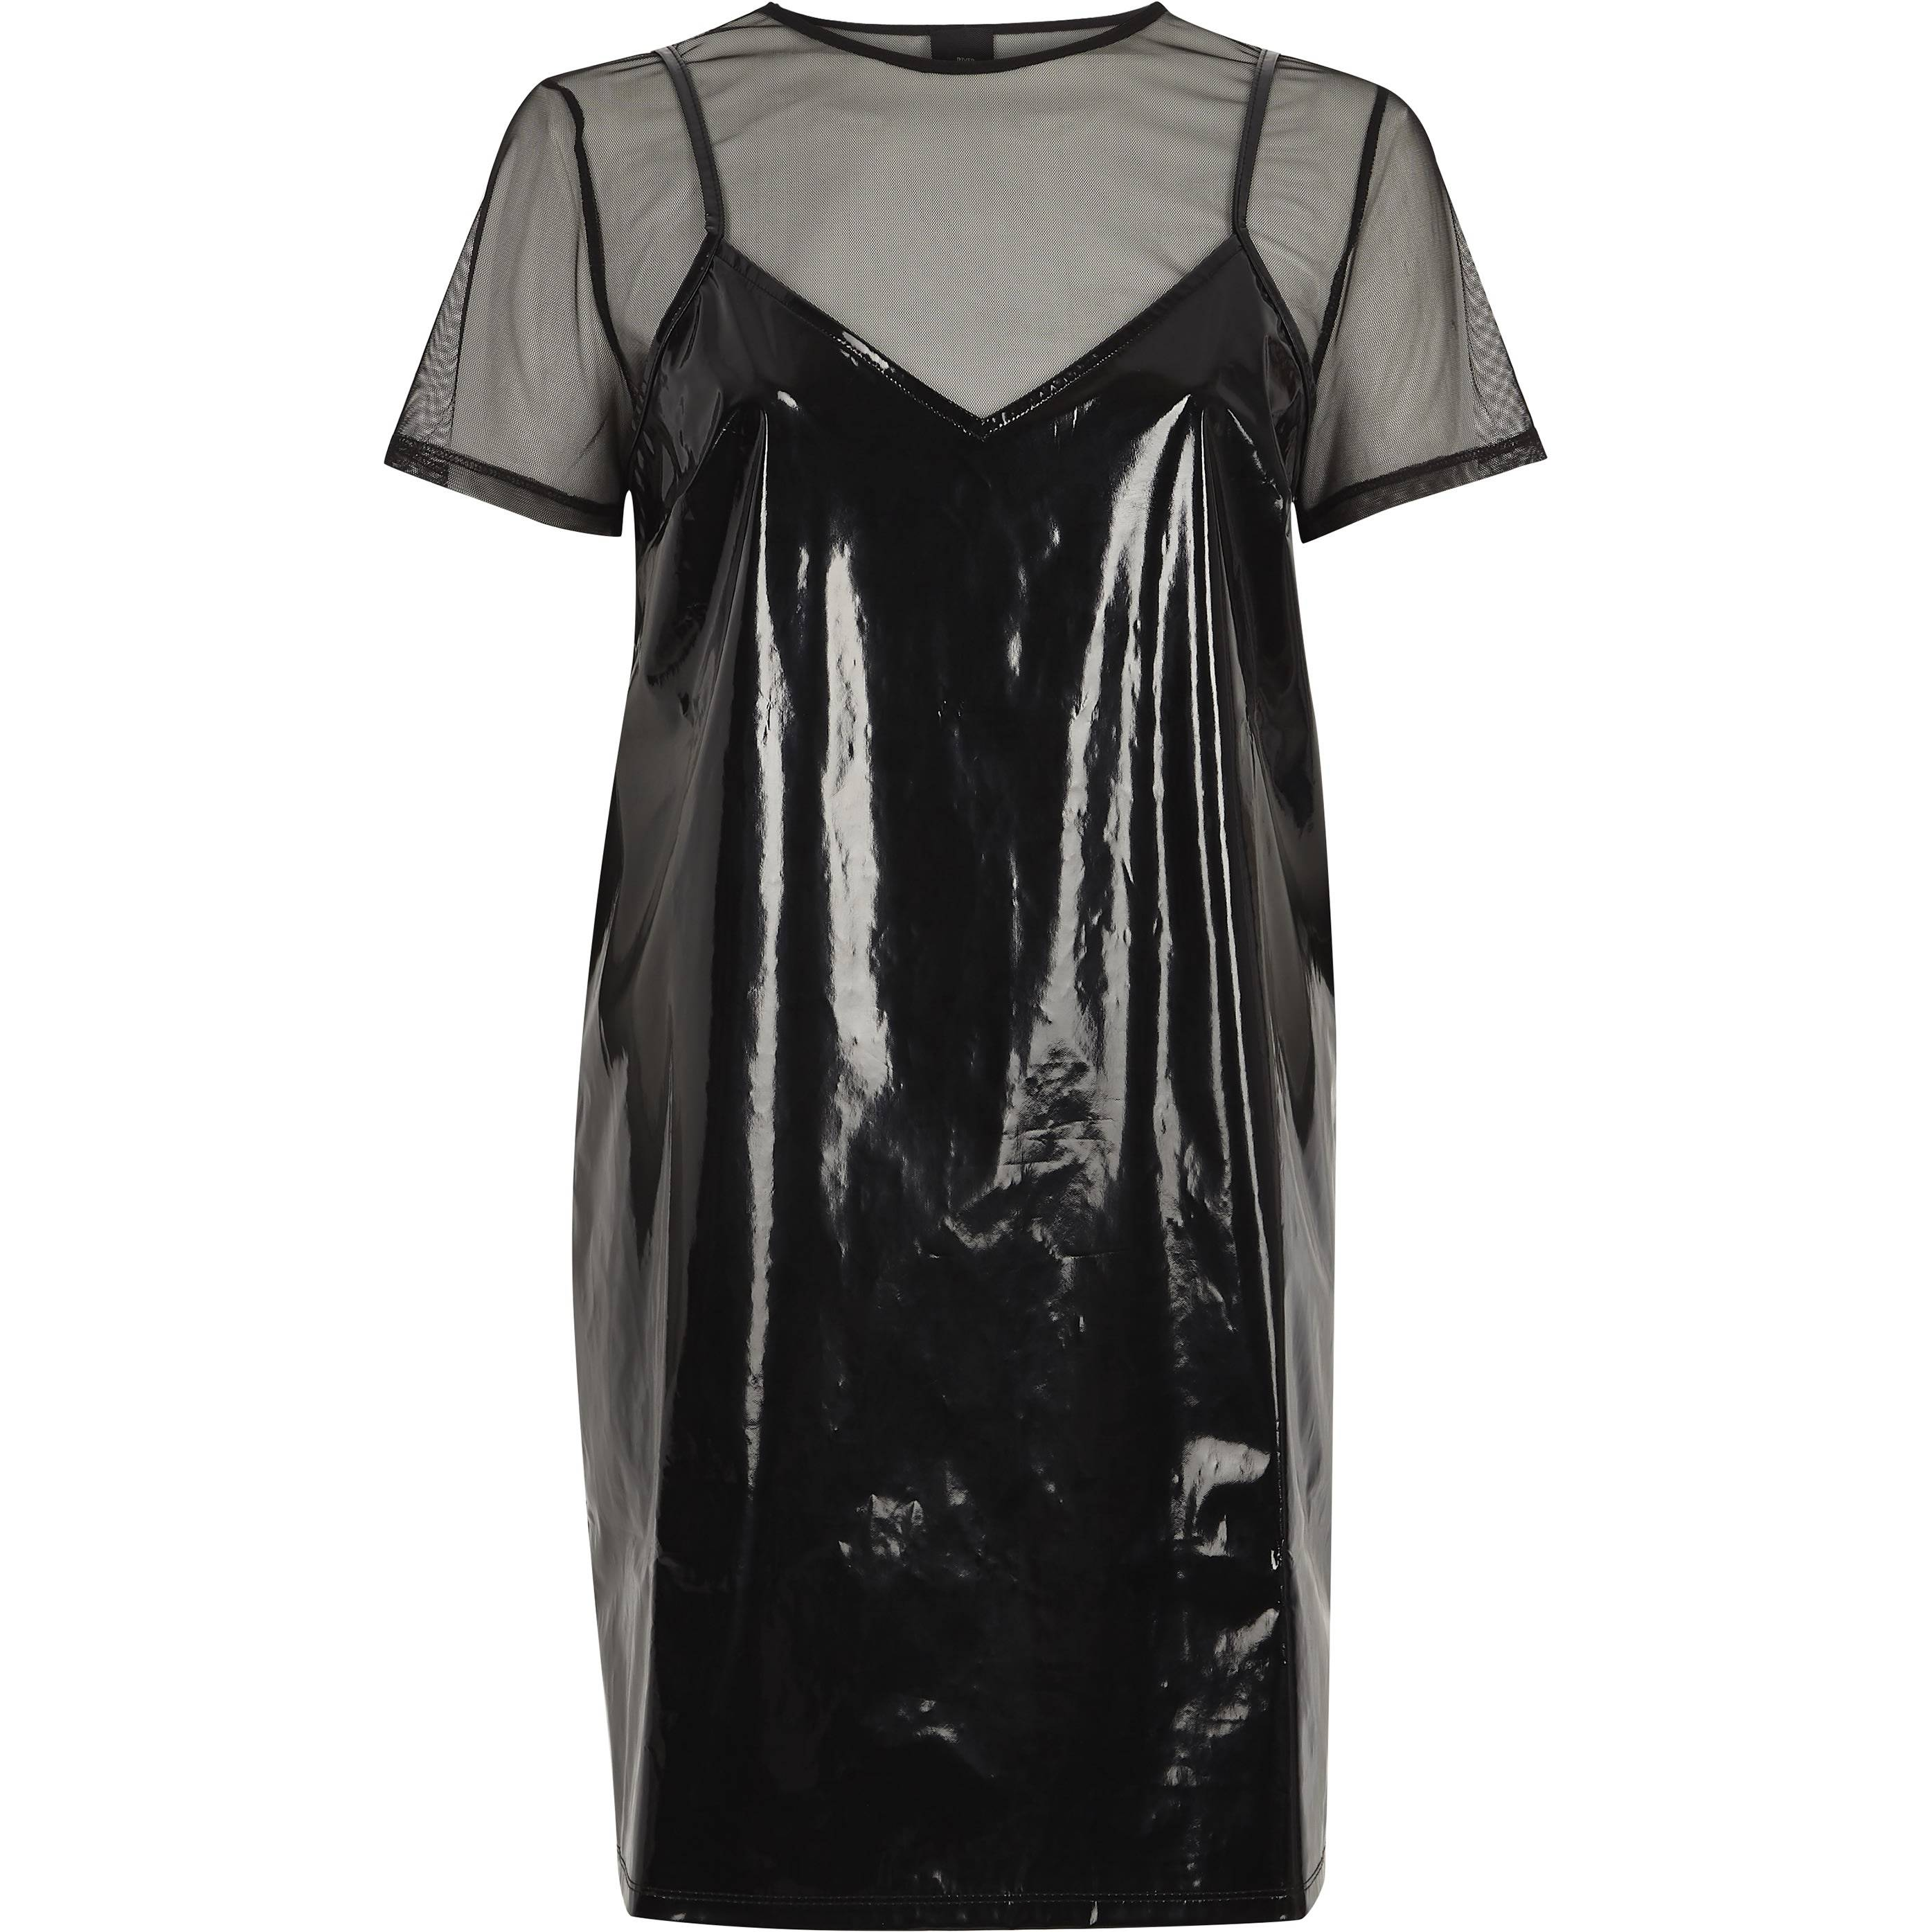 River Island Black vinyl and mesh T-shirt dress (6)